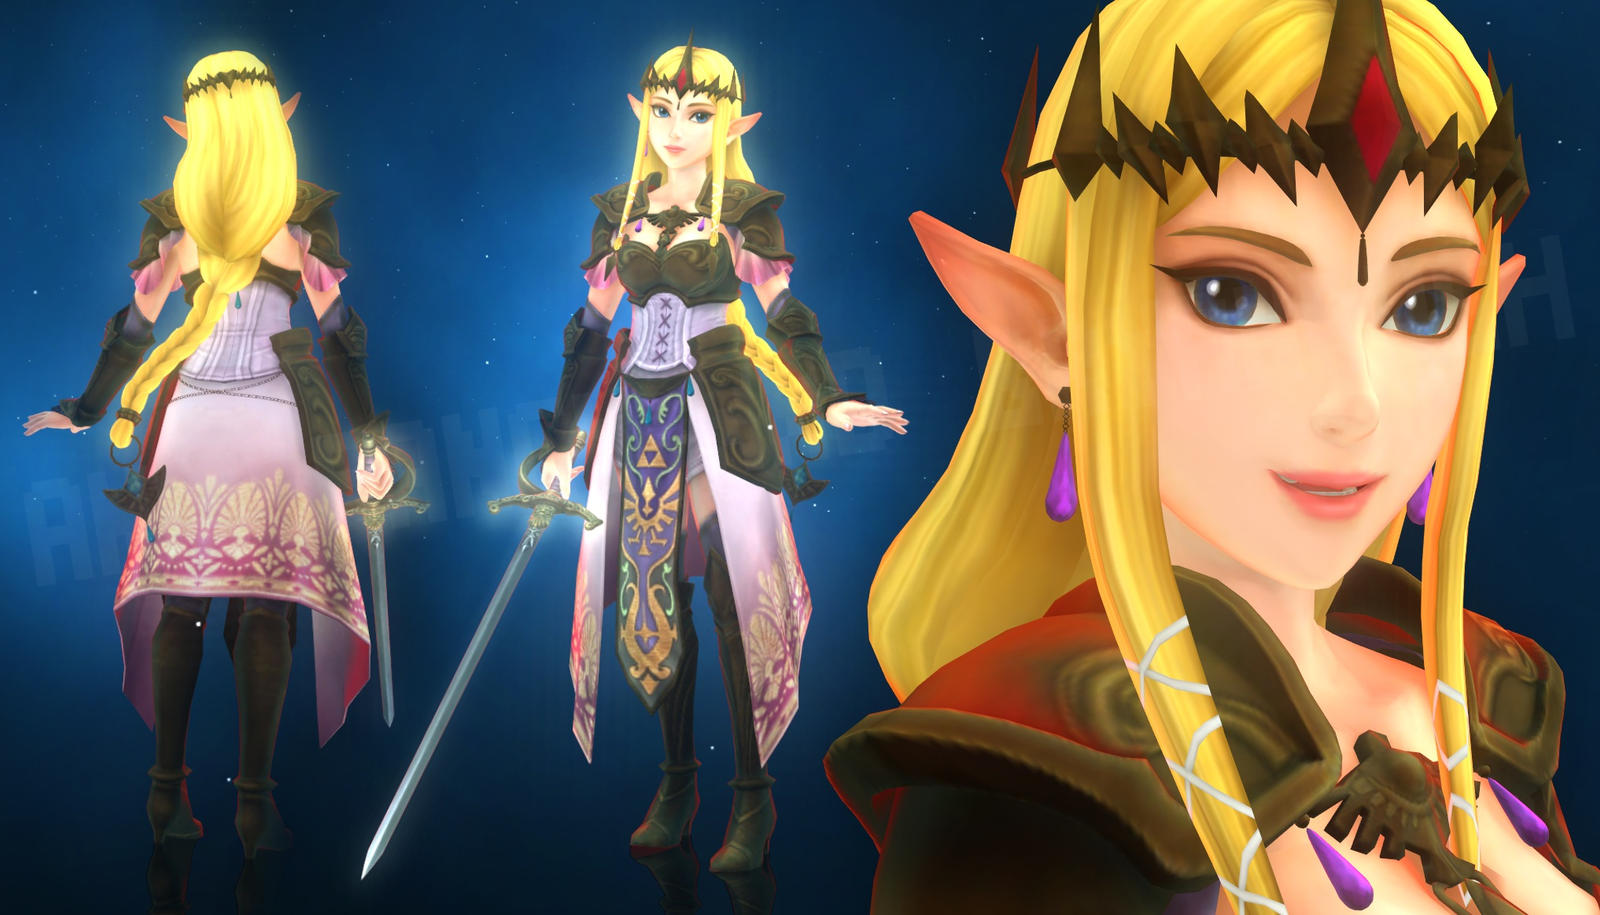 Zelda - Hyrule Warriors (MMD Render Test)